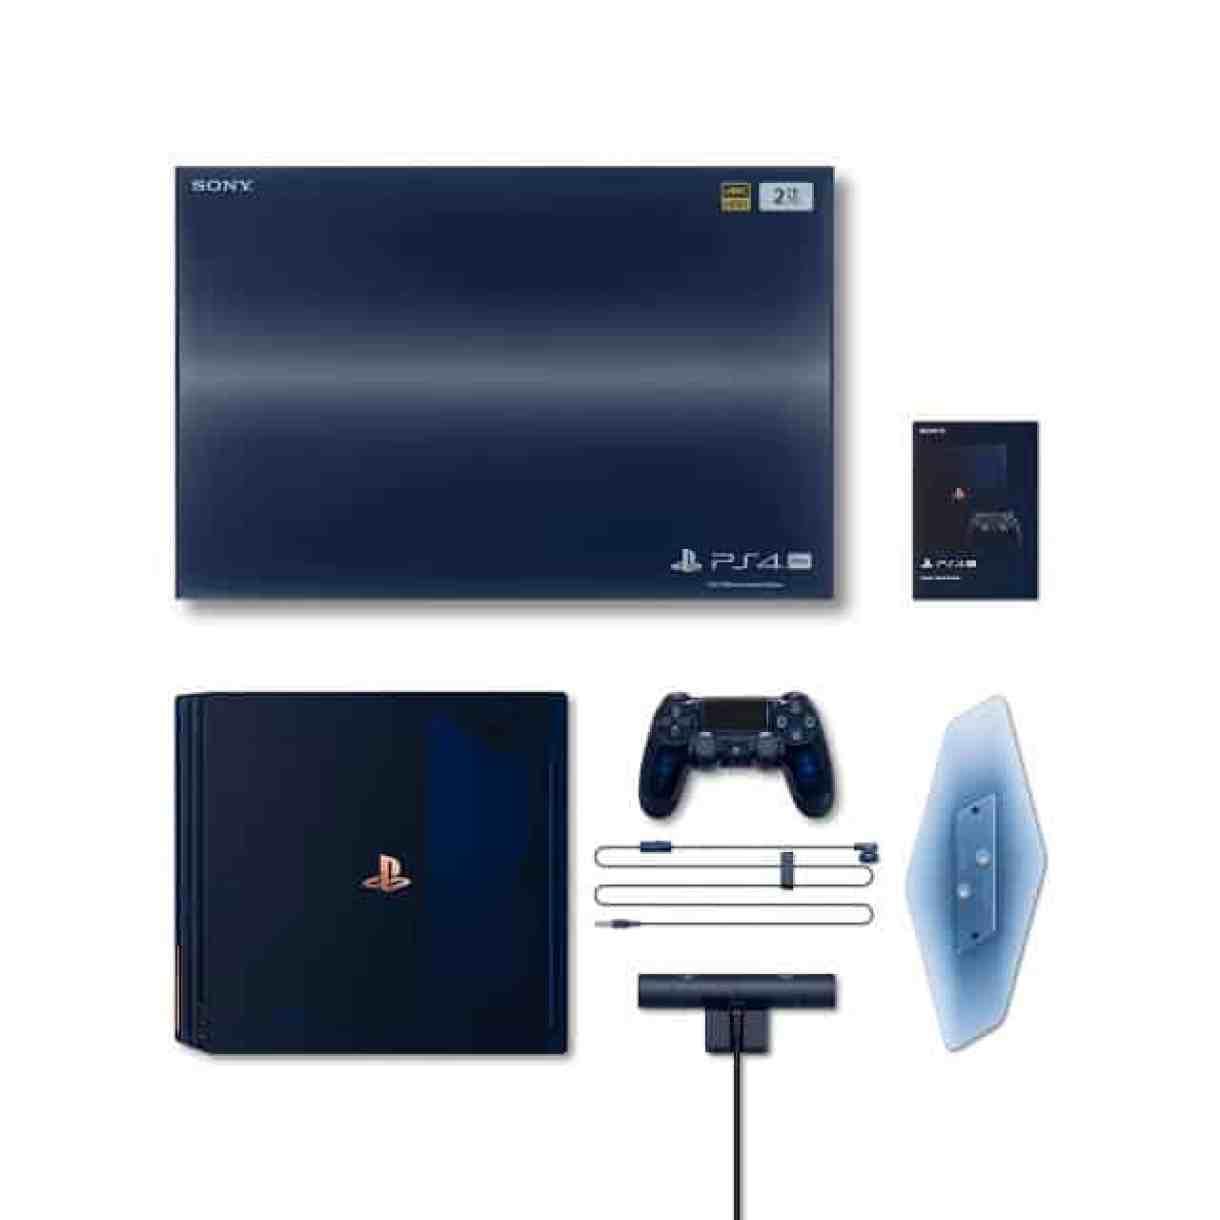 - PS4Pro 500Million acc 2 - Sony เปิดตัว PS 4 Pro รุ่นพิเศษเฉลิมฉลองยอดจำหน่ายเกิน 500 ล้านเครื่อง มาในแบบโปร่งแสงเห็นไส้ใน